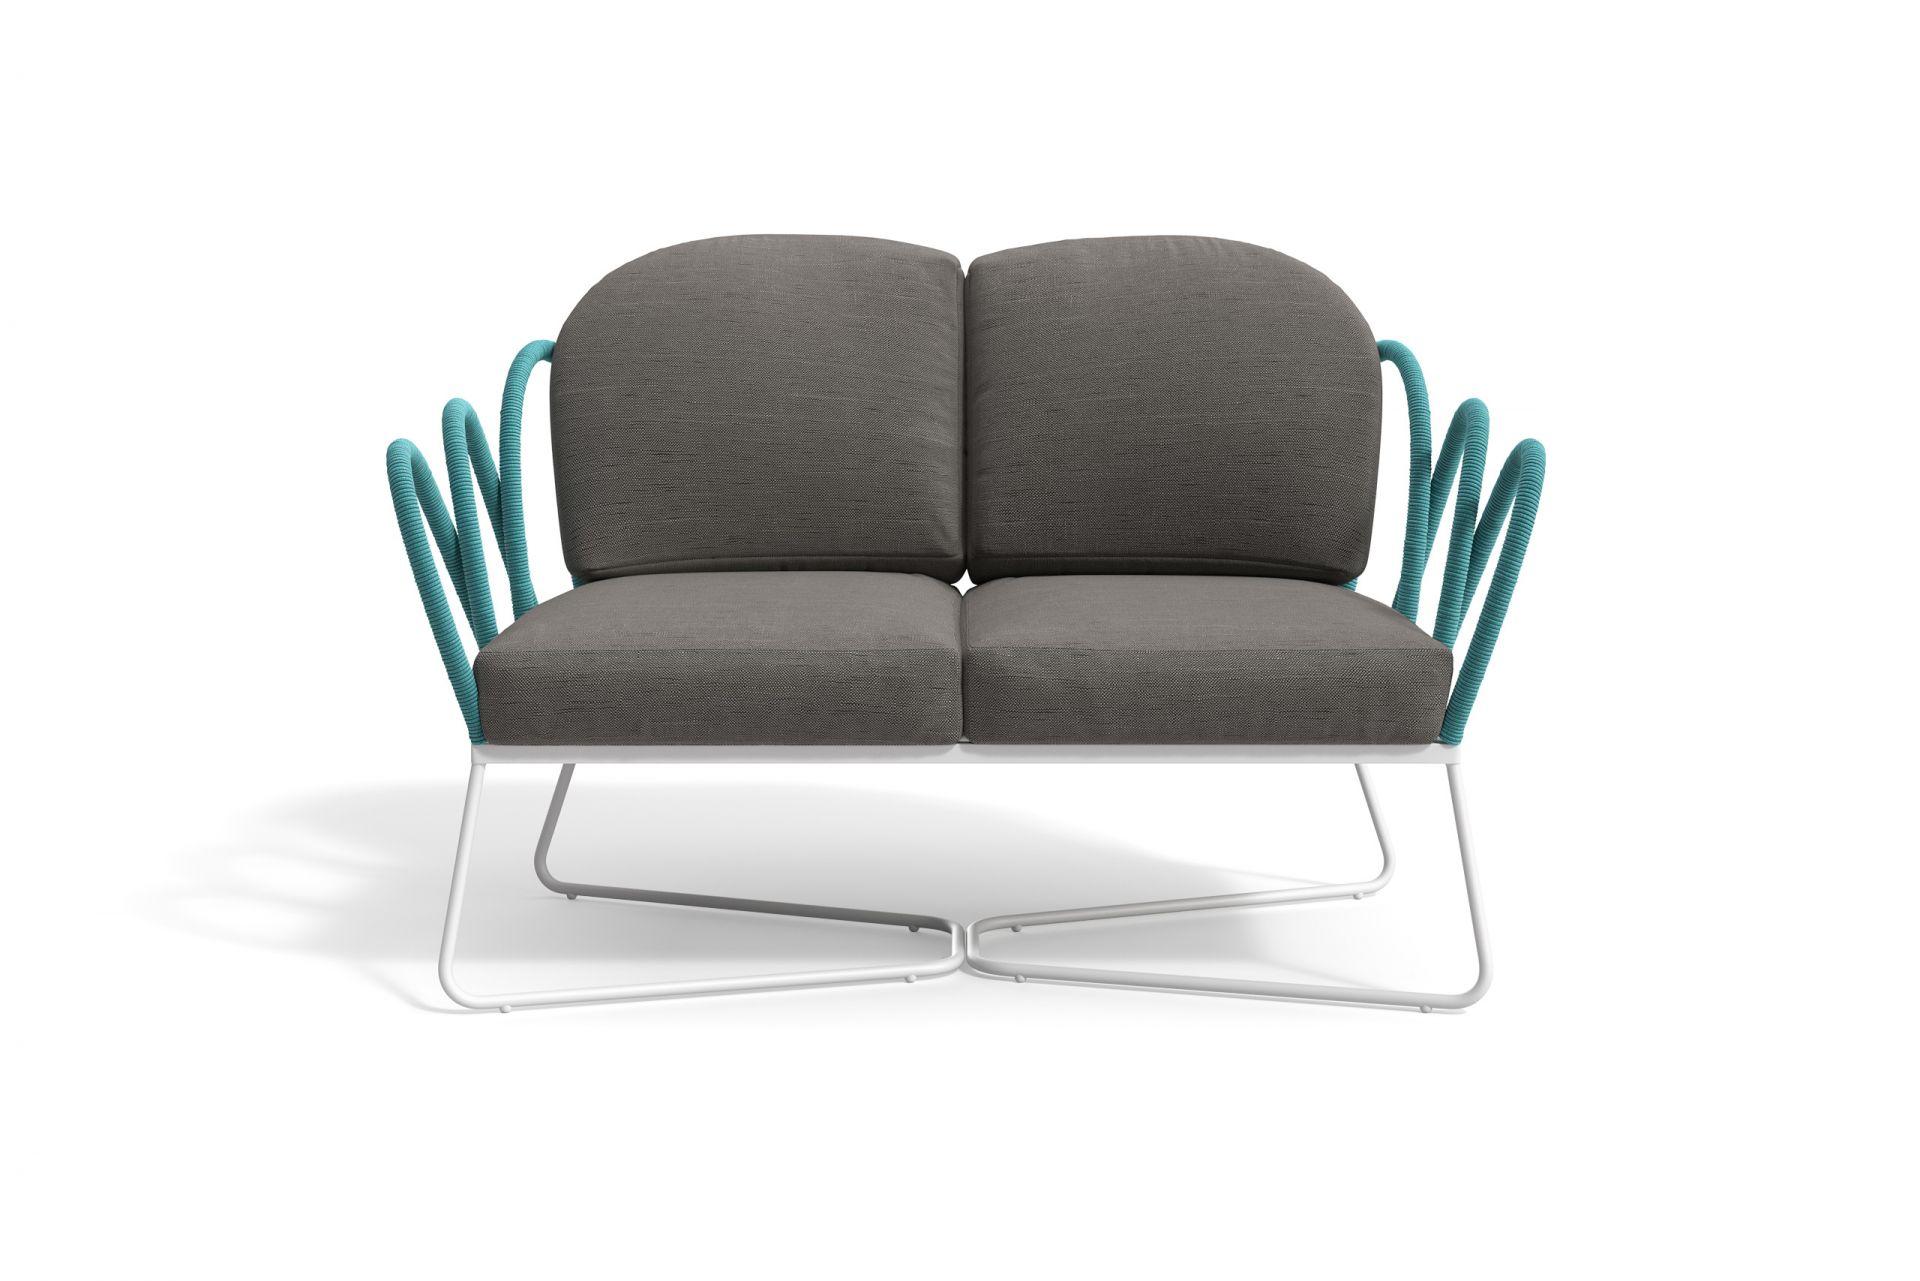 SANTORINI 2-Sitzer